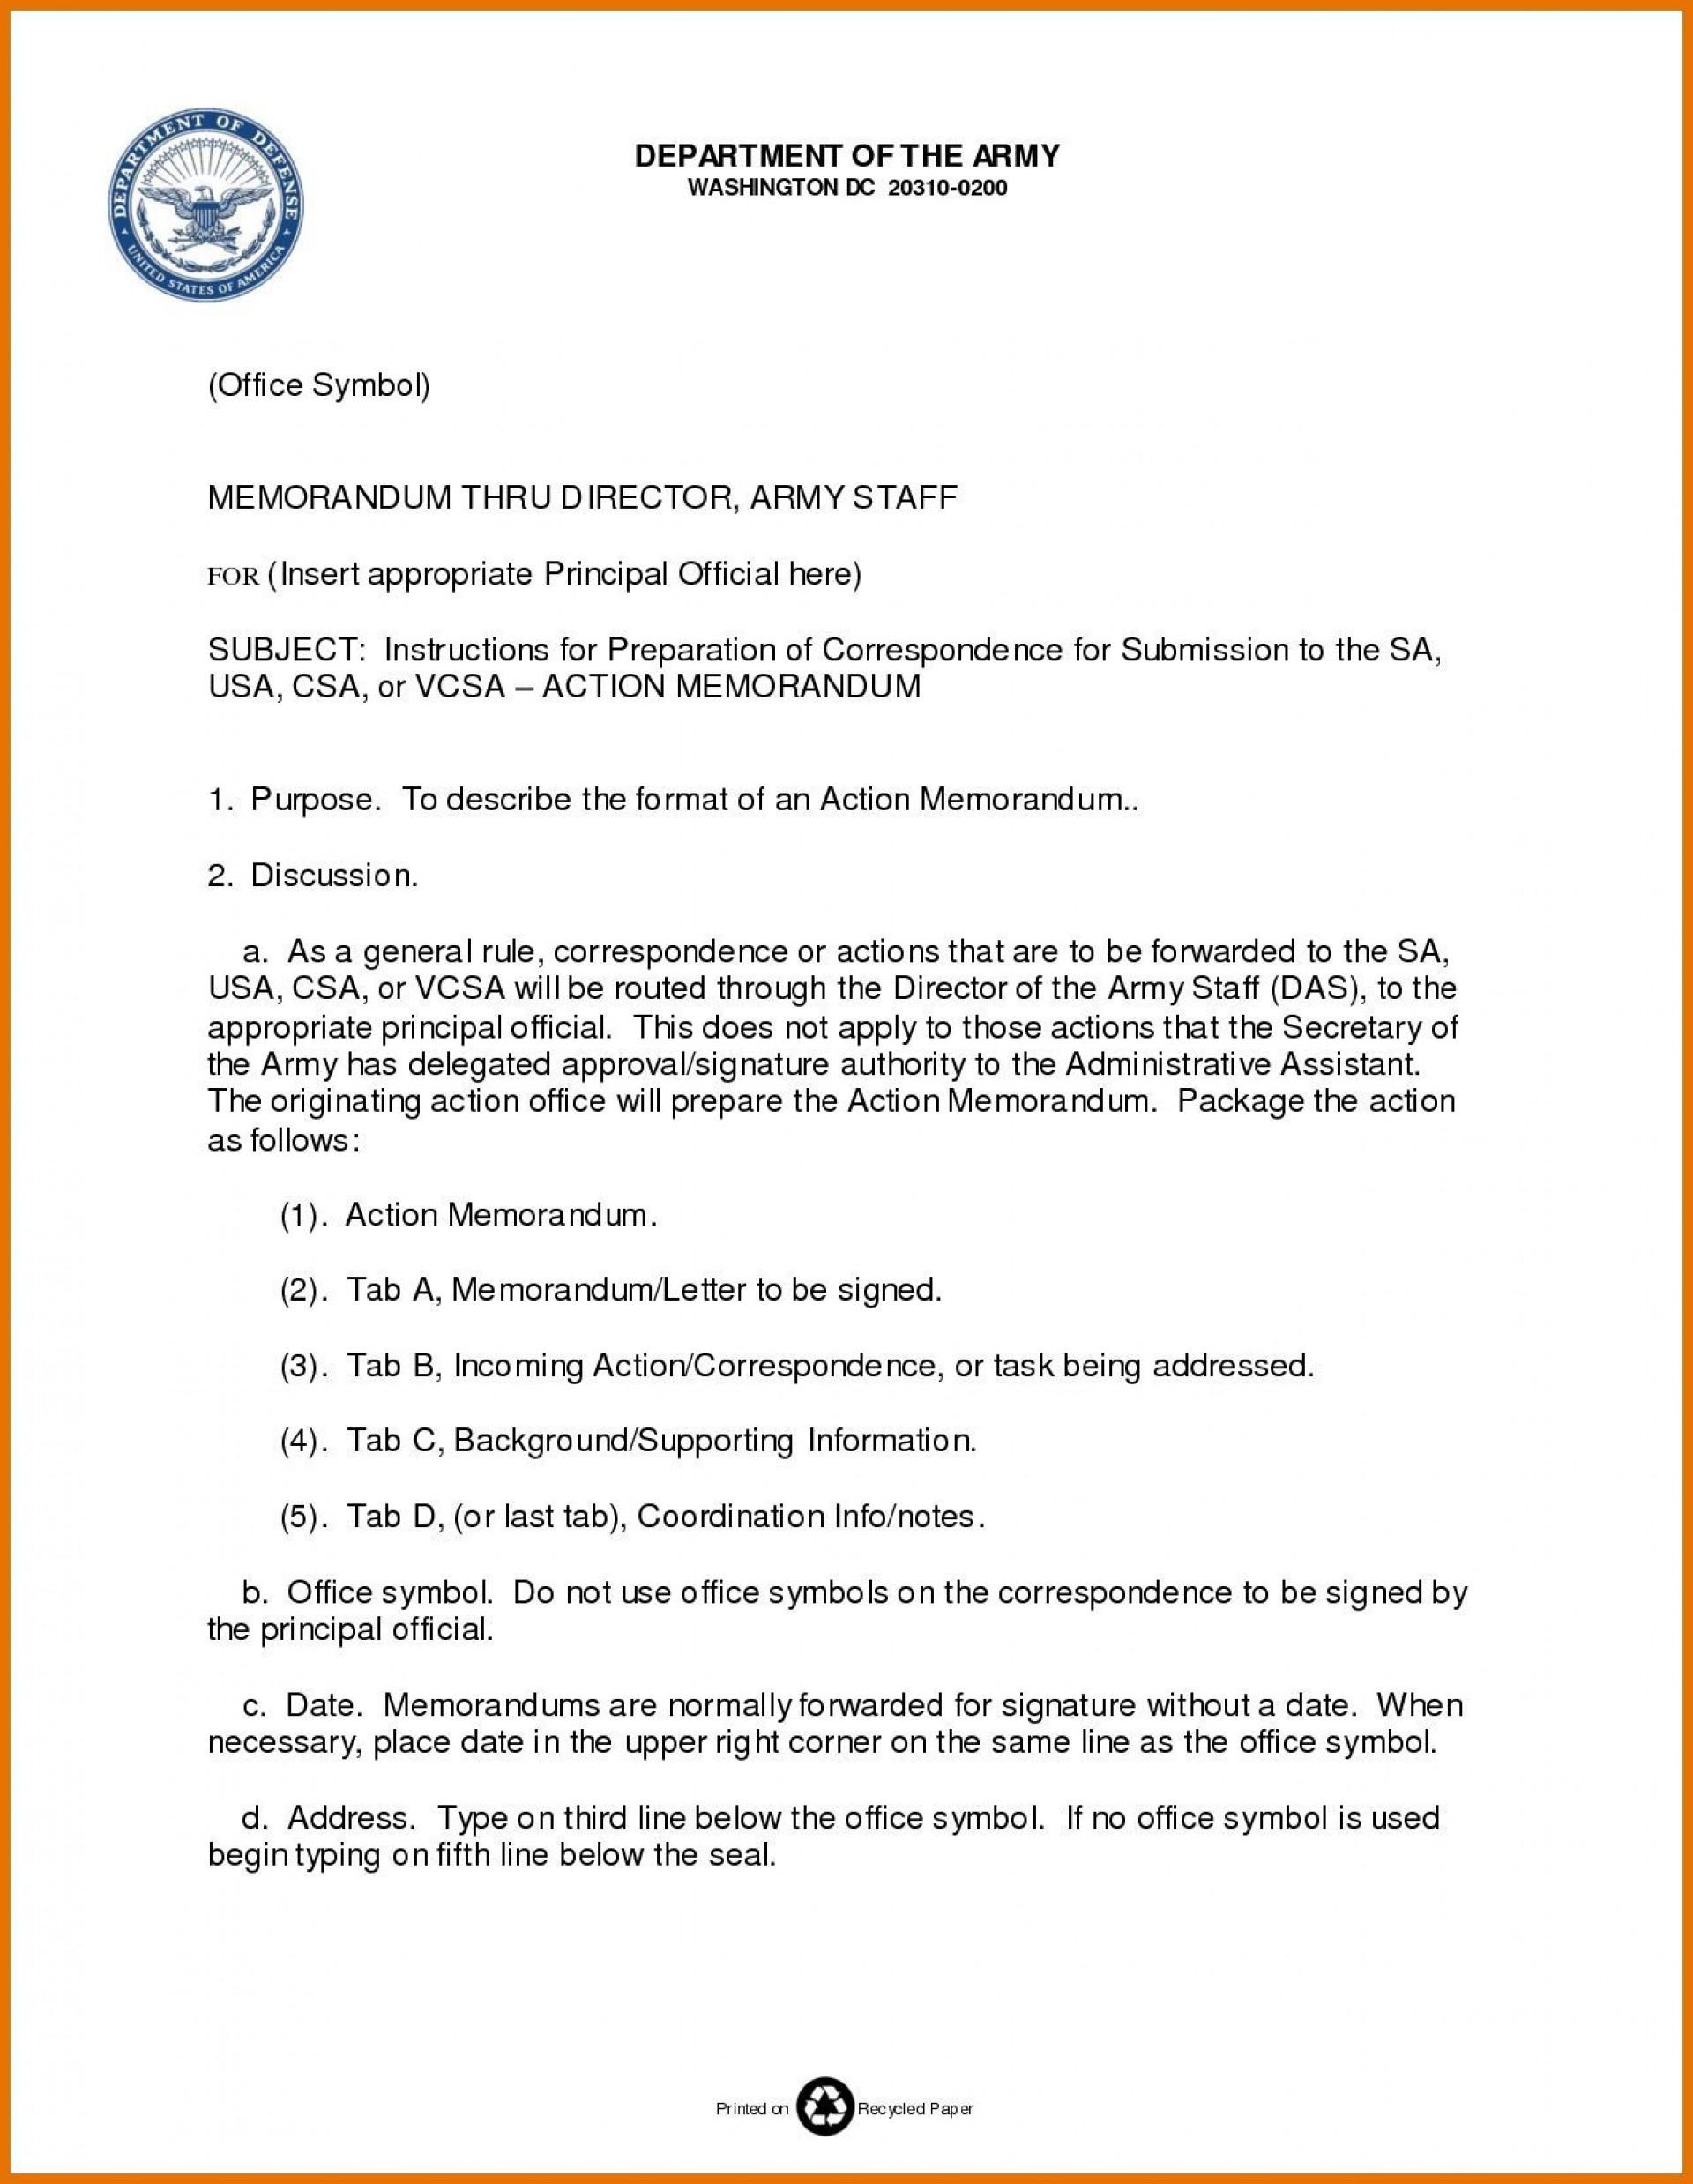 002 Best Microsoft Word Army Memorandum Template High Def 1920